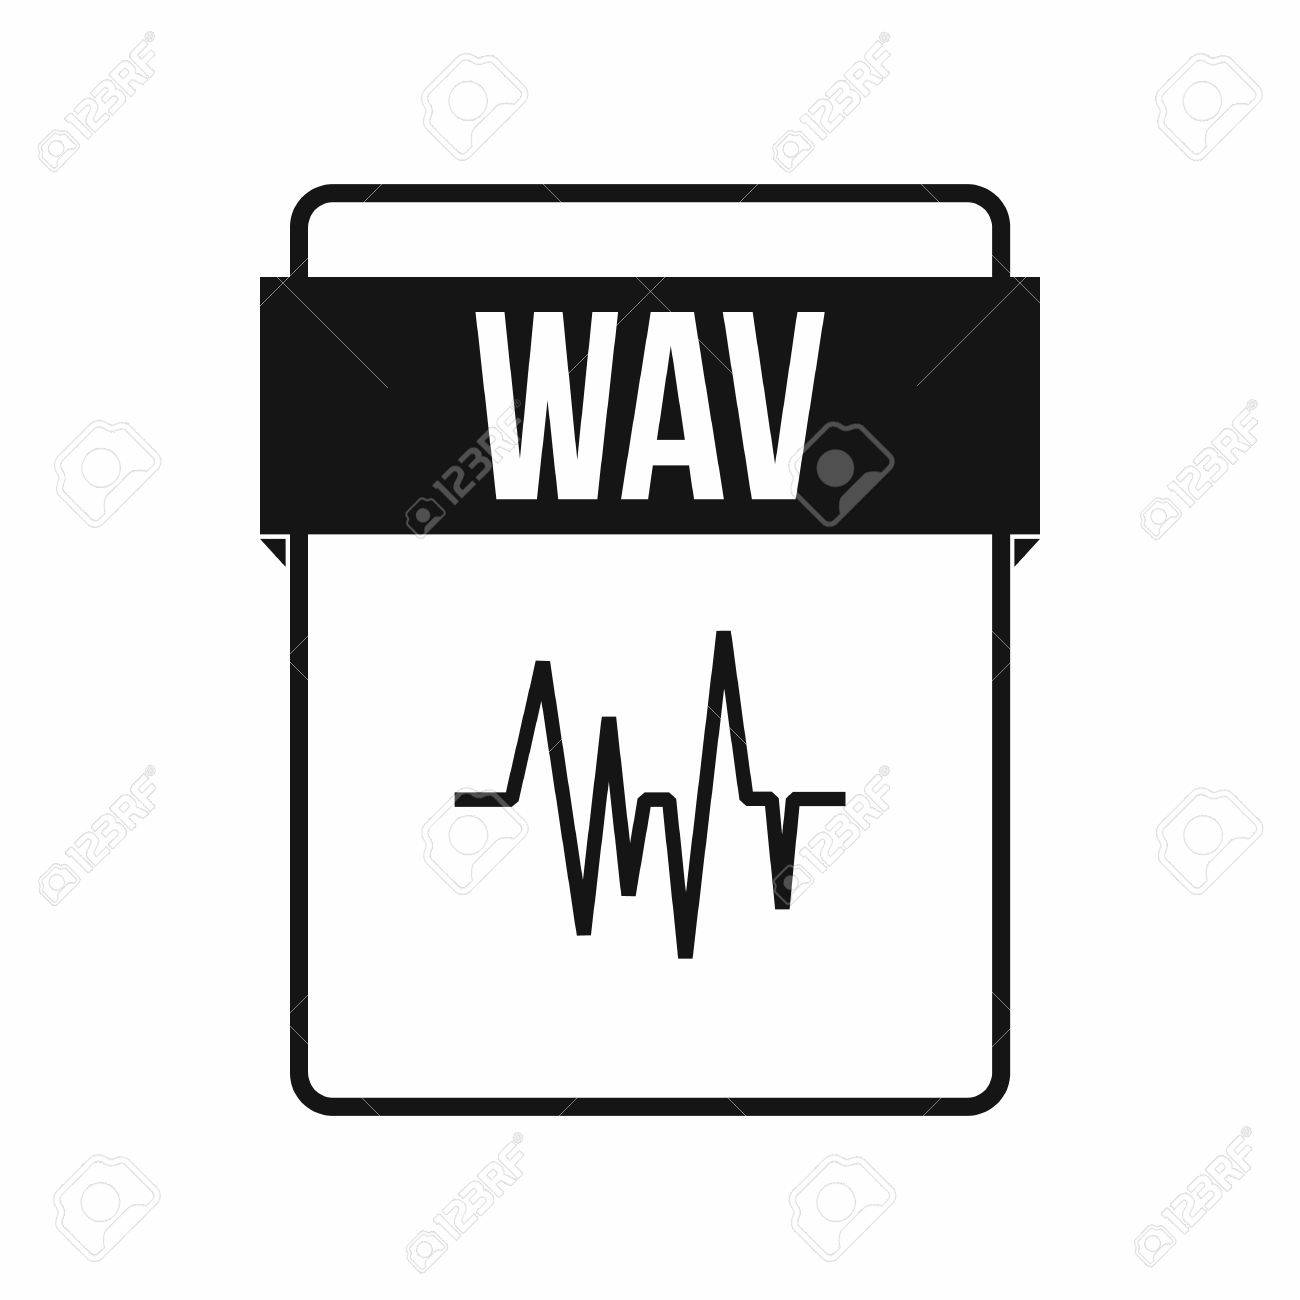 Digital-audio-Windows Media Audio-Datei-format WAV - Mp png herunterladen -  640*640 - Kostenlos transparent Text png Herunterladen.